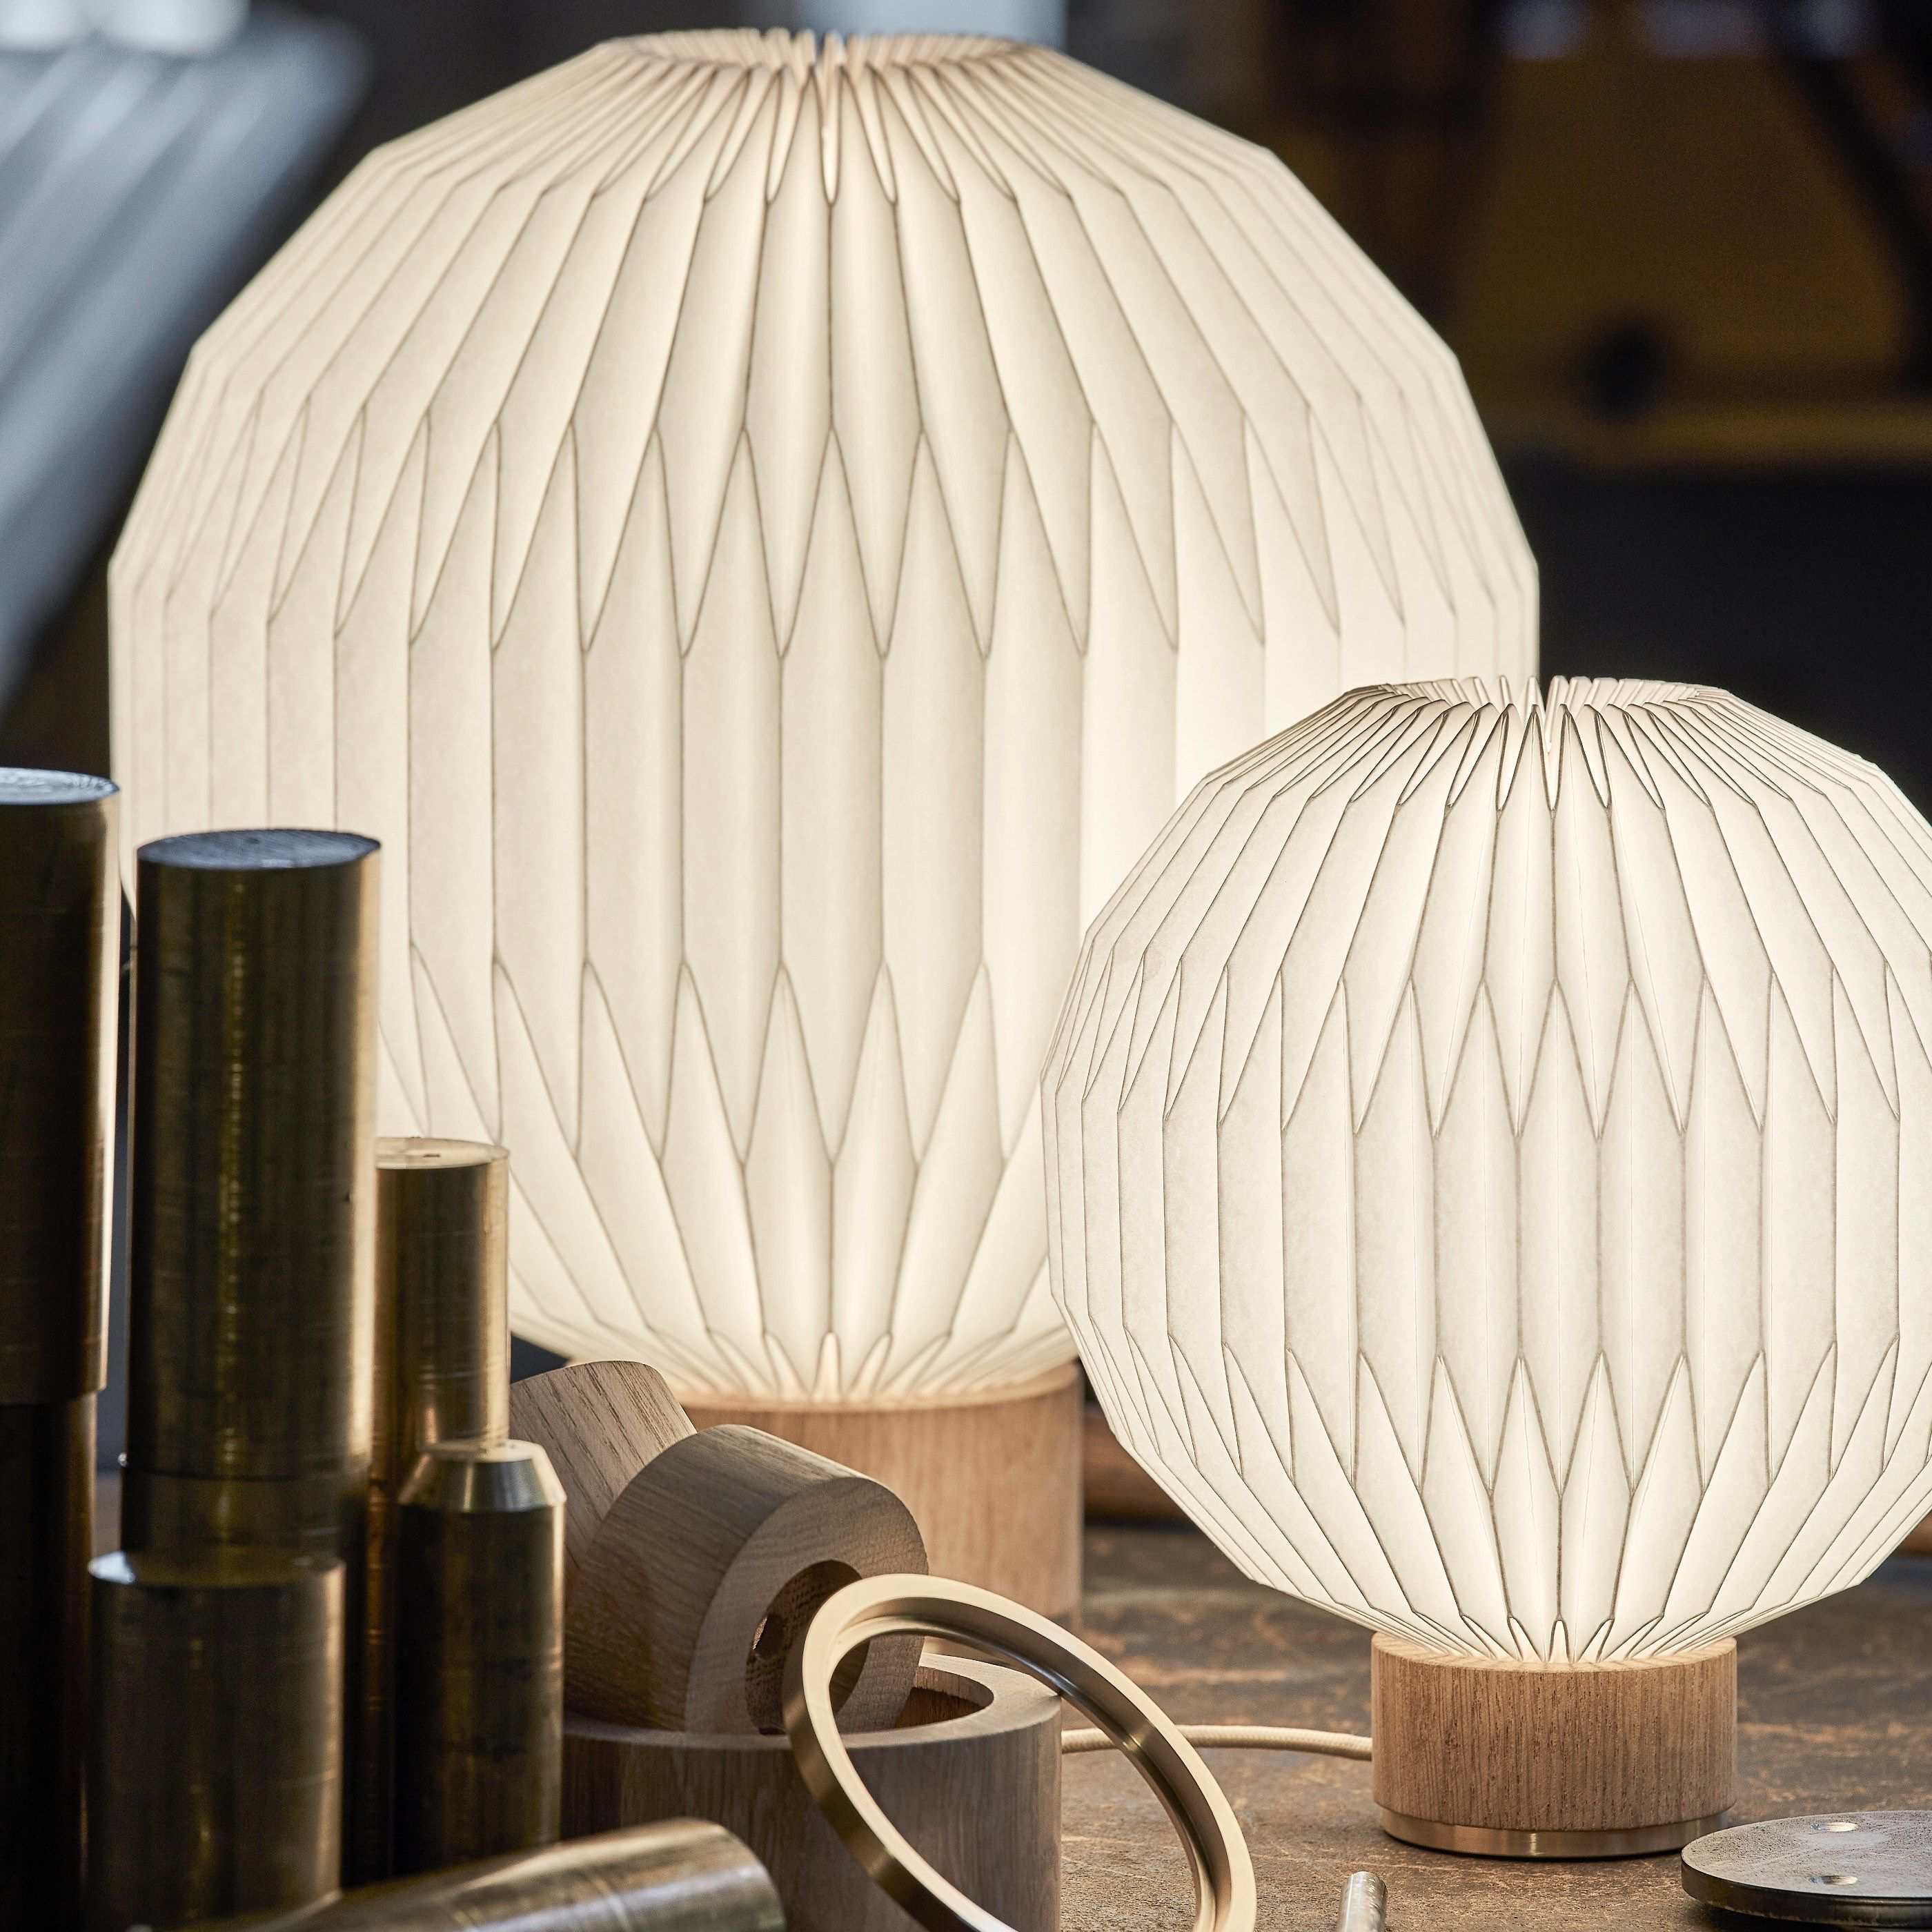 Based On The Iconic Lamp By Danish Designer Esben Klint 375m And